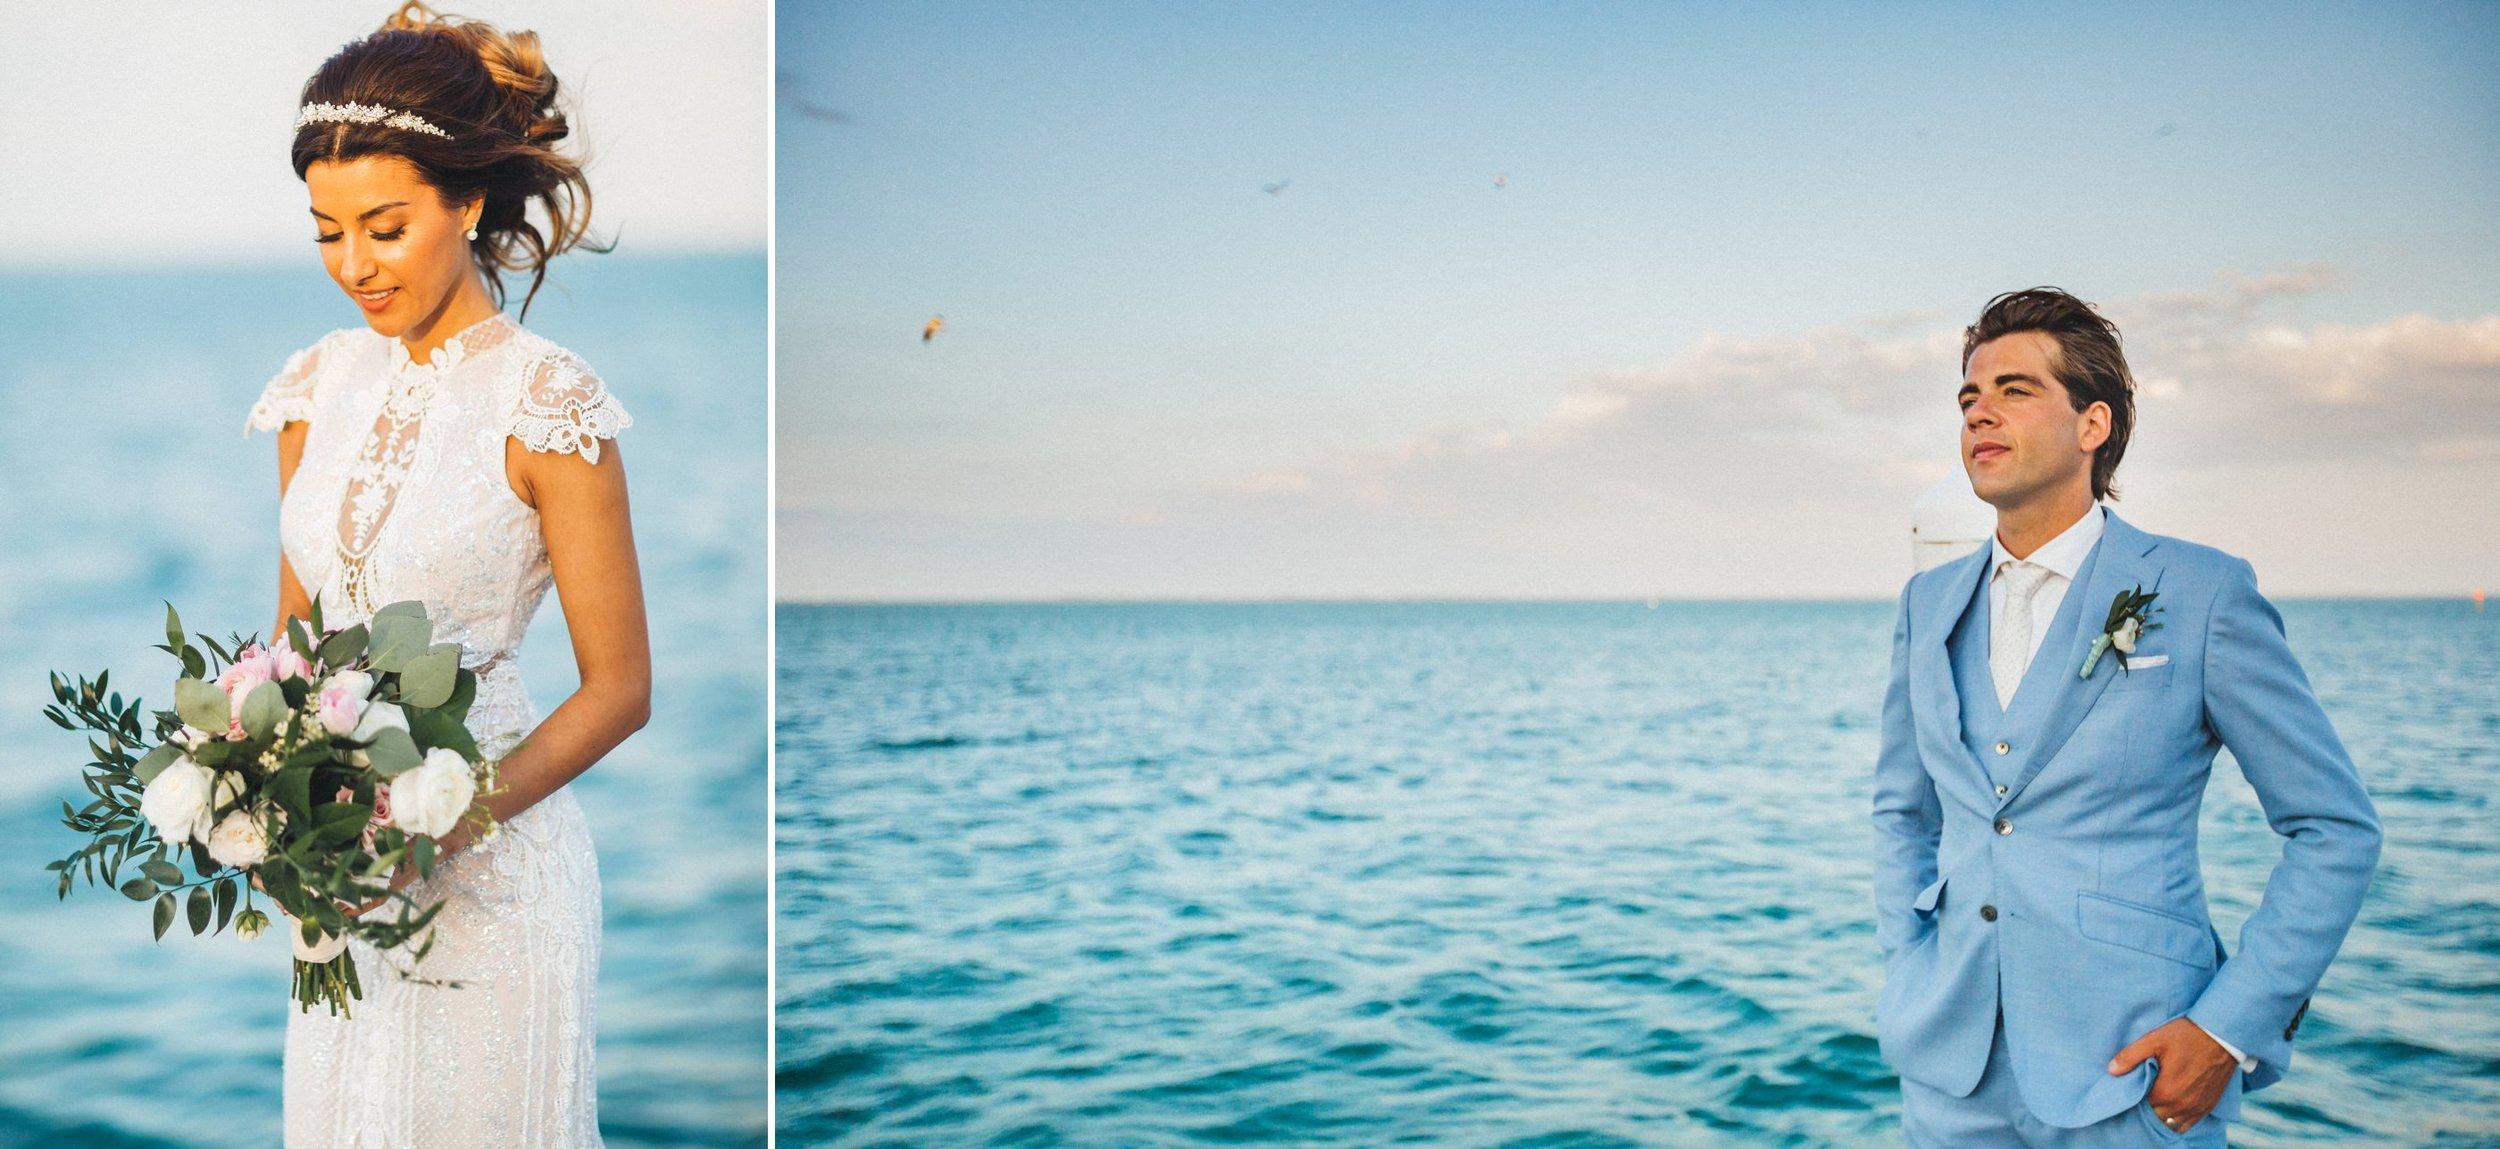 Captiva Island Destination Elopement Wedding Photography-blog- Zohra+David-by-Shaina-DeCiryan27.jpg